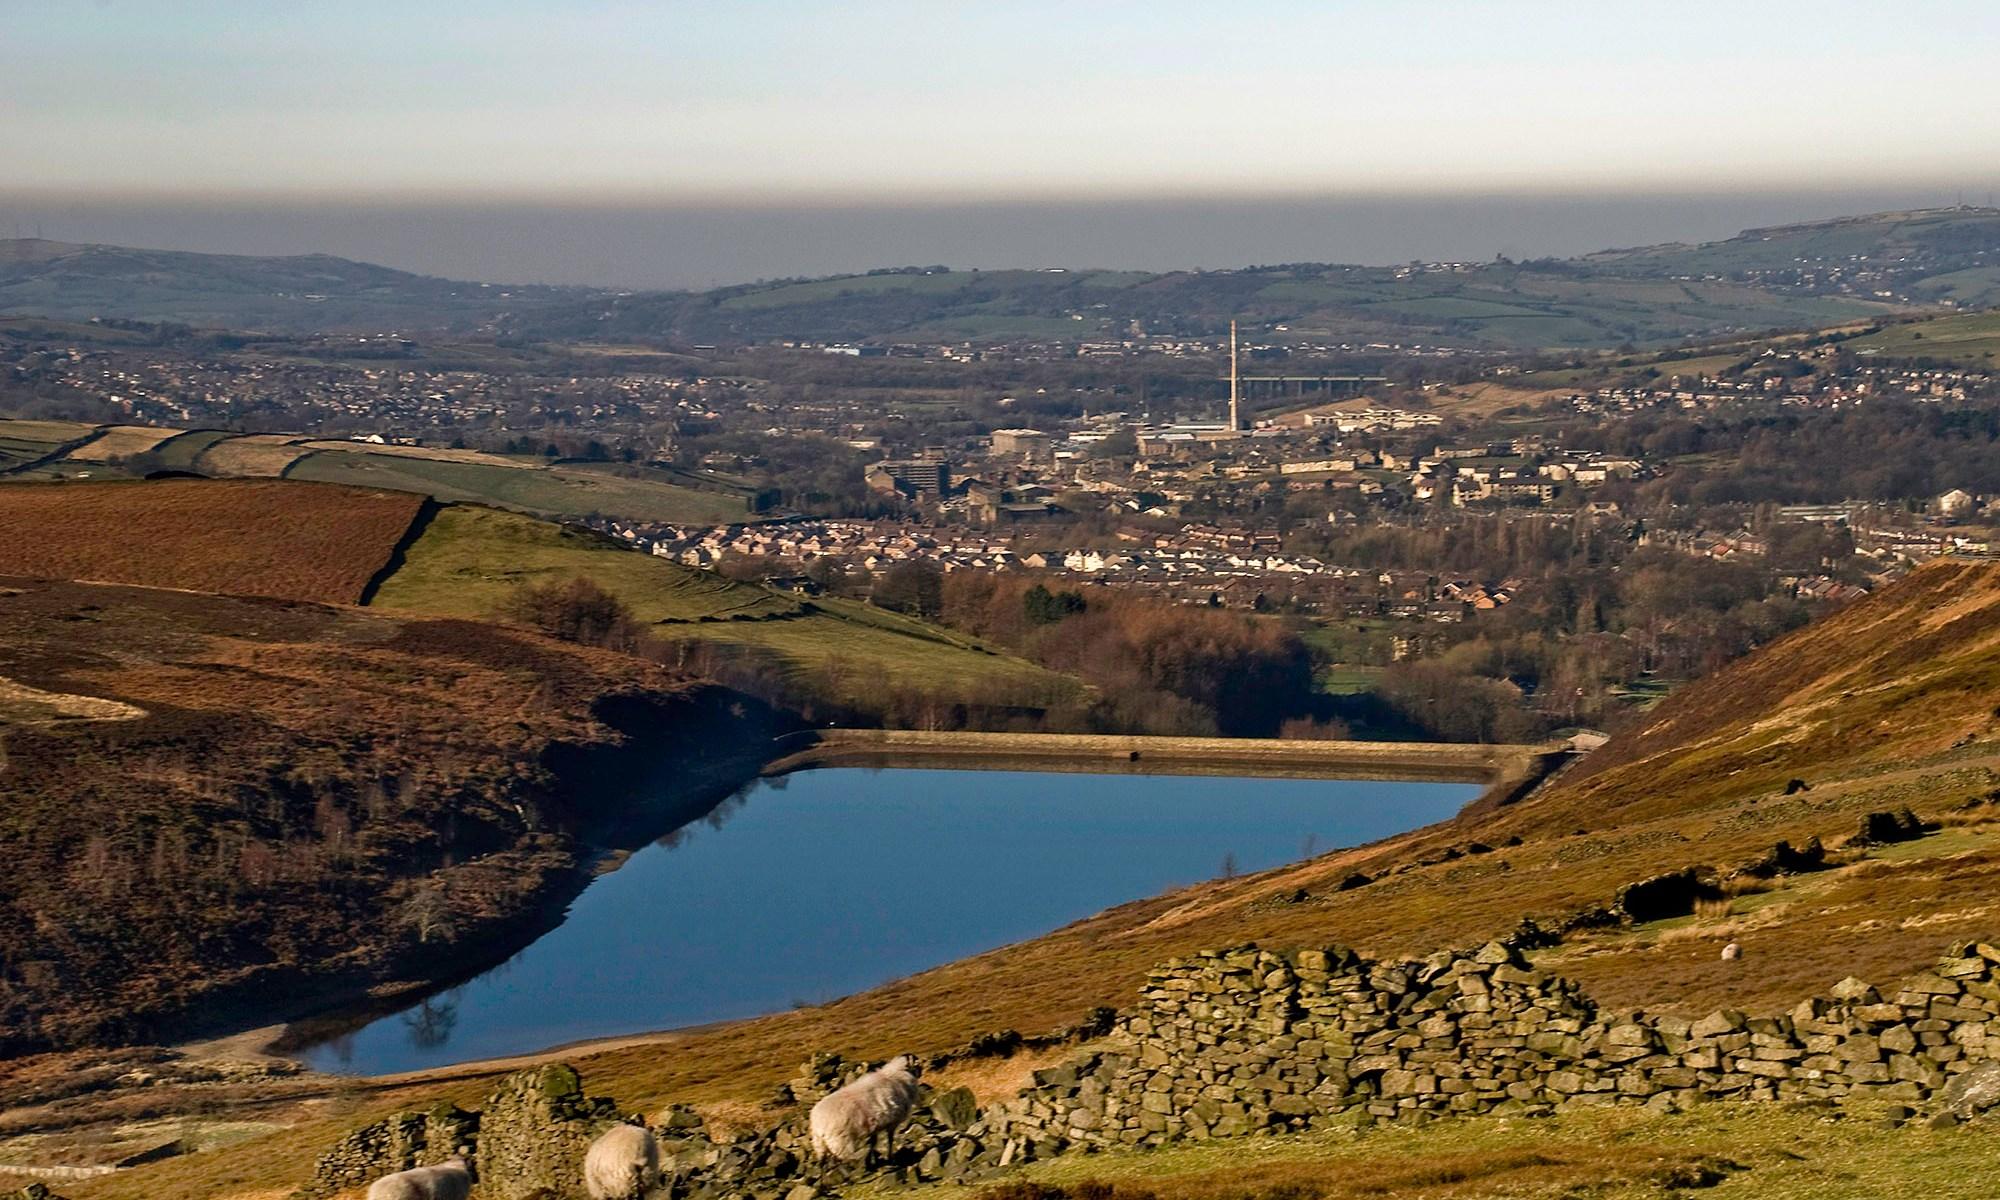 Hurst Reservoir, Peak District, Derbyshire